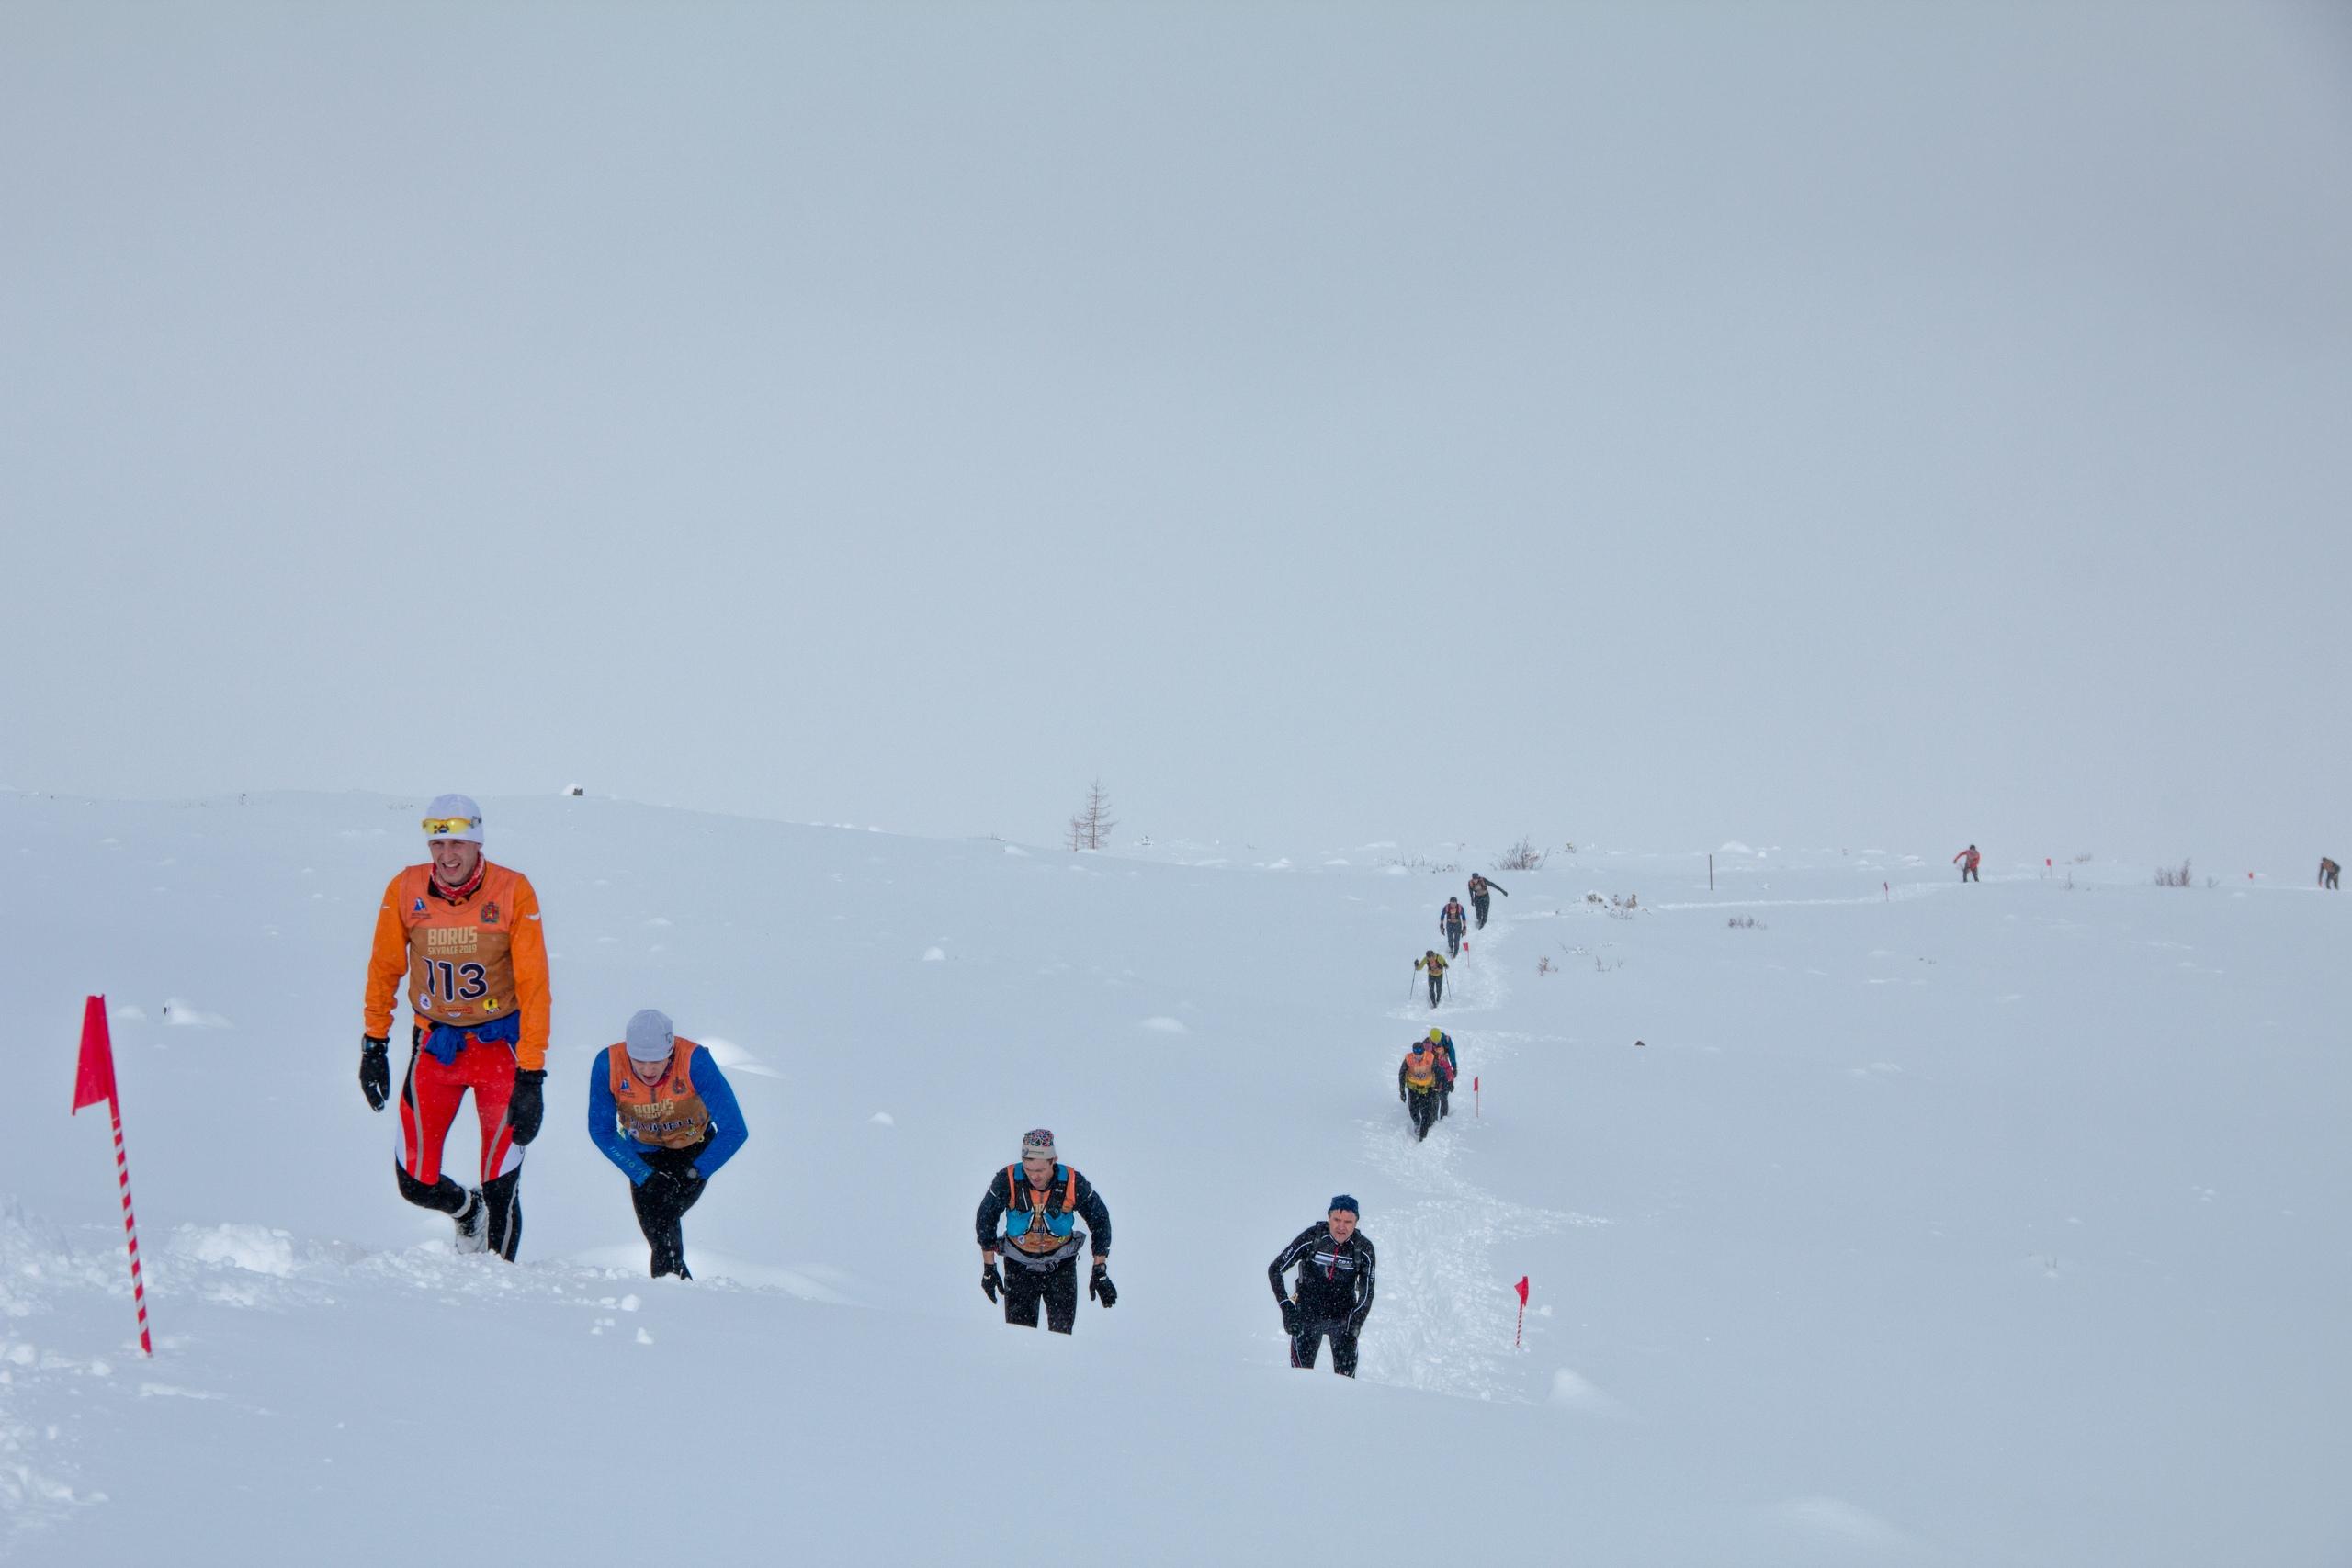 Лидеры на плато. Фото: Павел Хорст